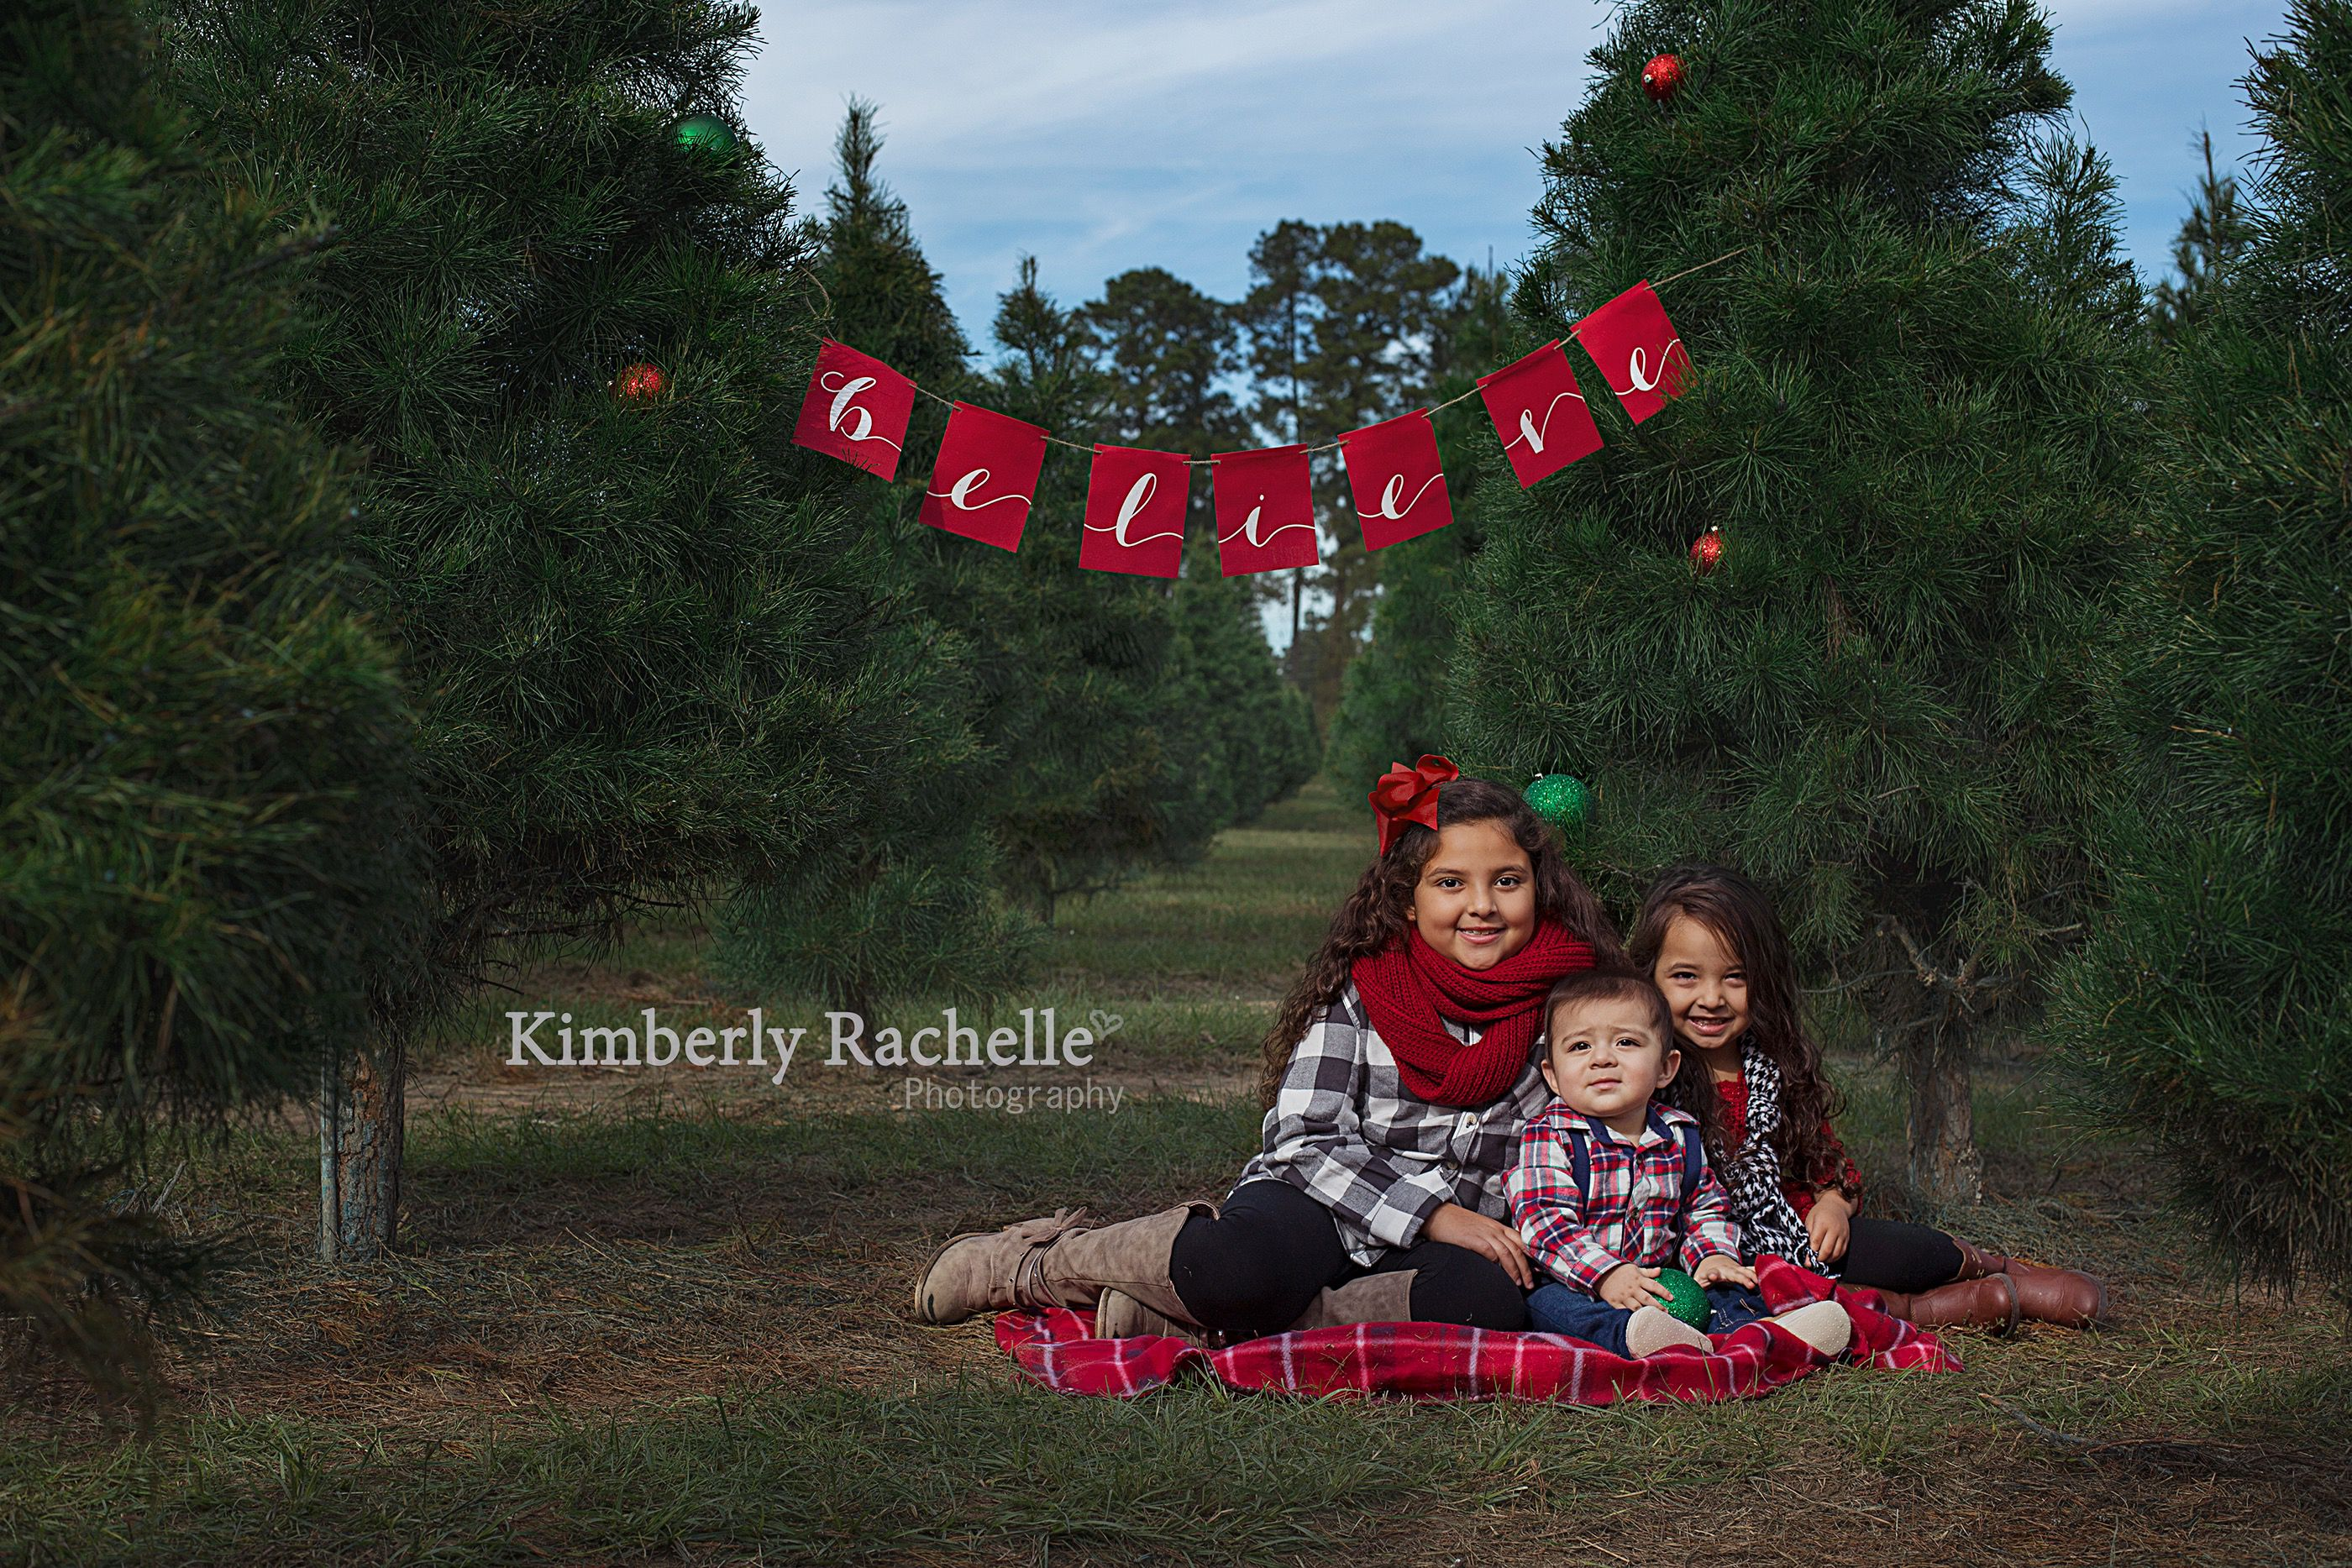 Houston Newborn Photography Cypress Kimberly Rachelle Photography Christmas Tree Farm Photos Christmas Tree Farm Pictures Christmas Tree Farm